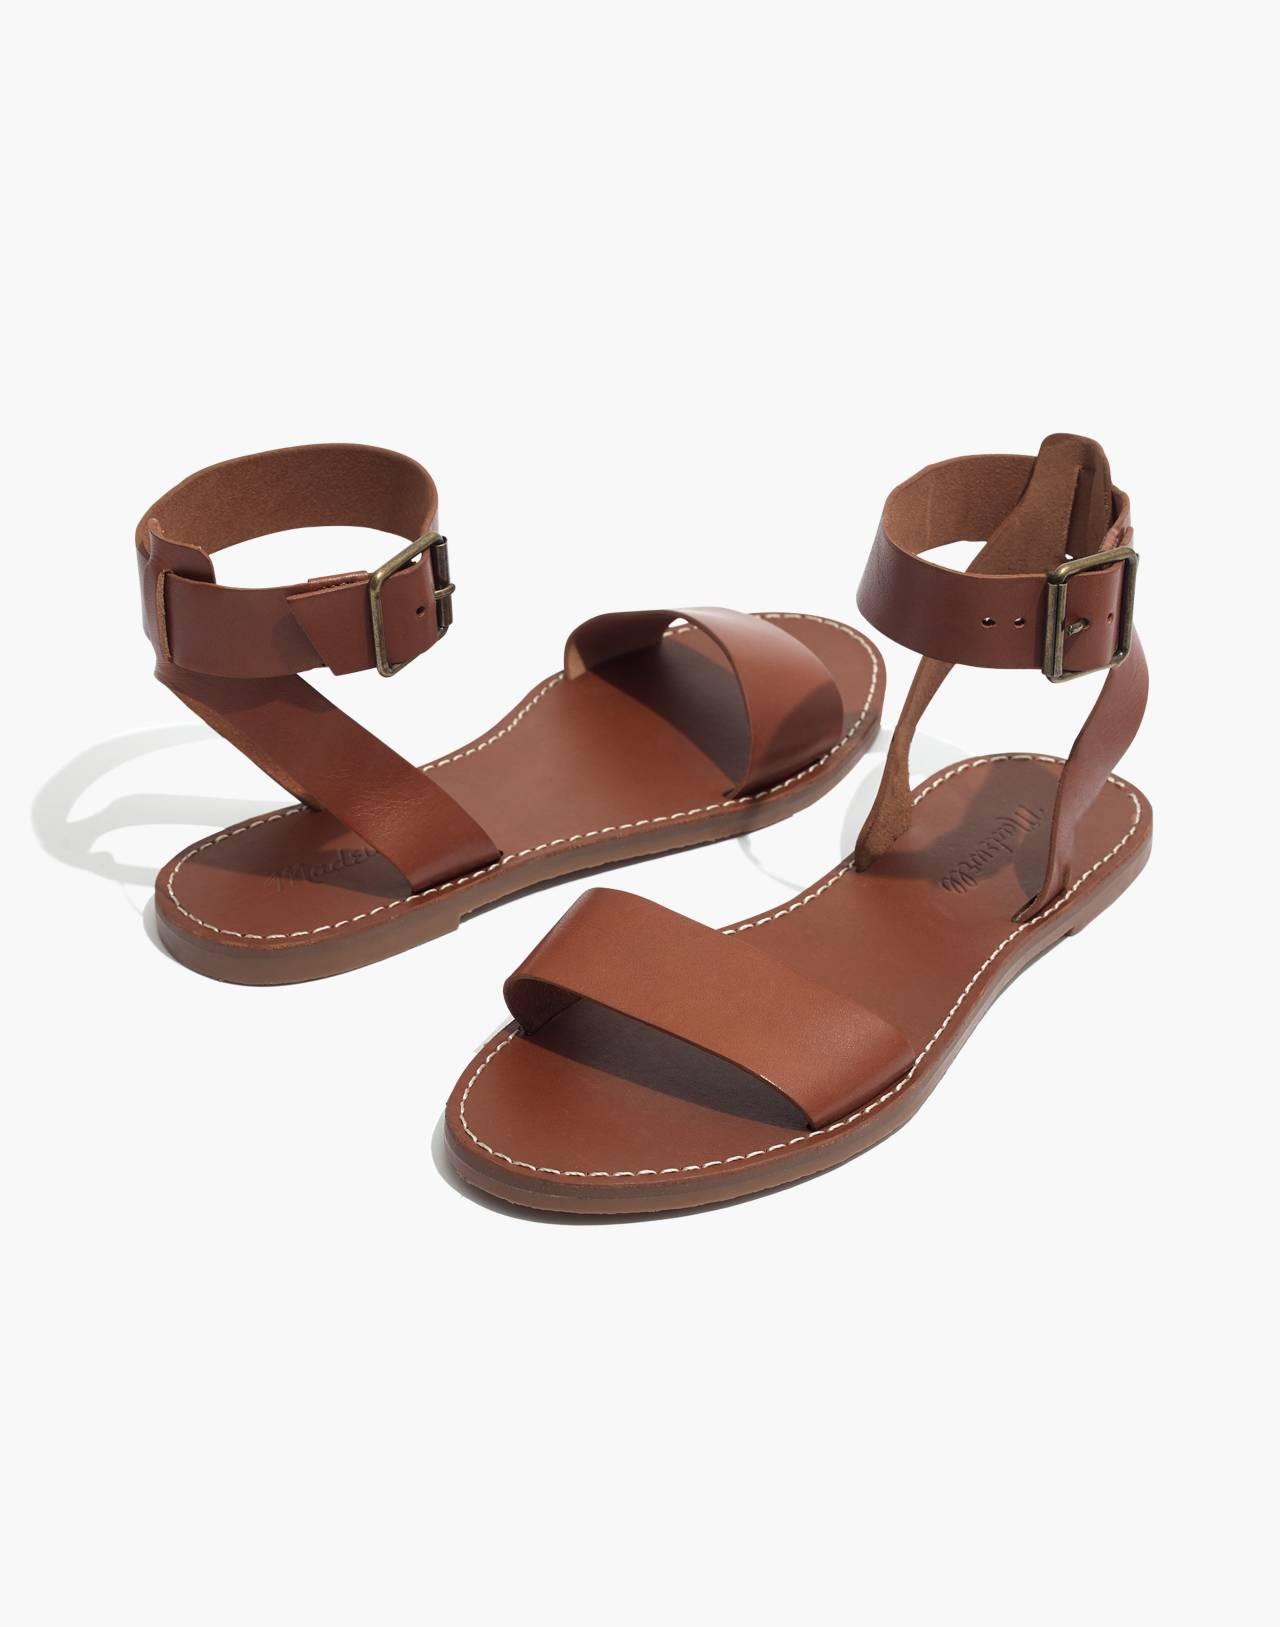 The Boardwalk Ankle-Strap Sandal in english saddle image 1